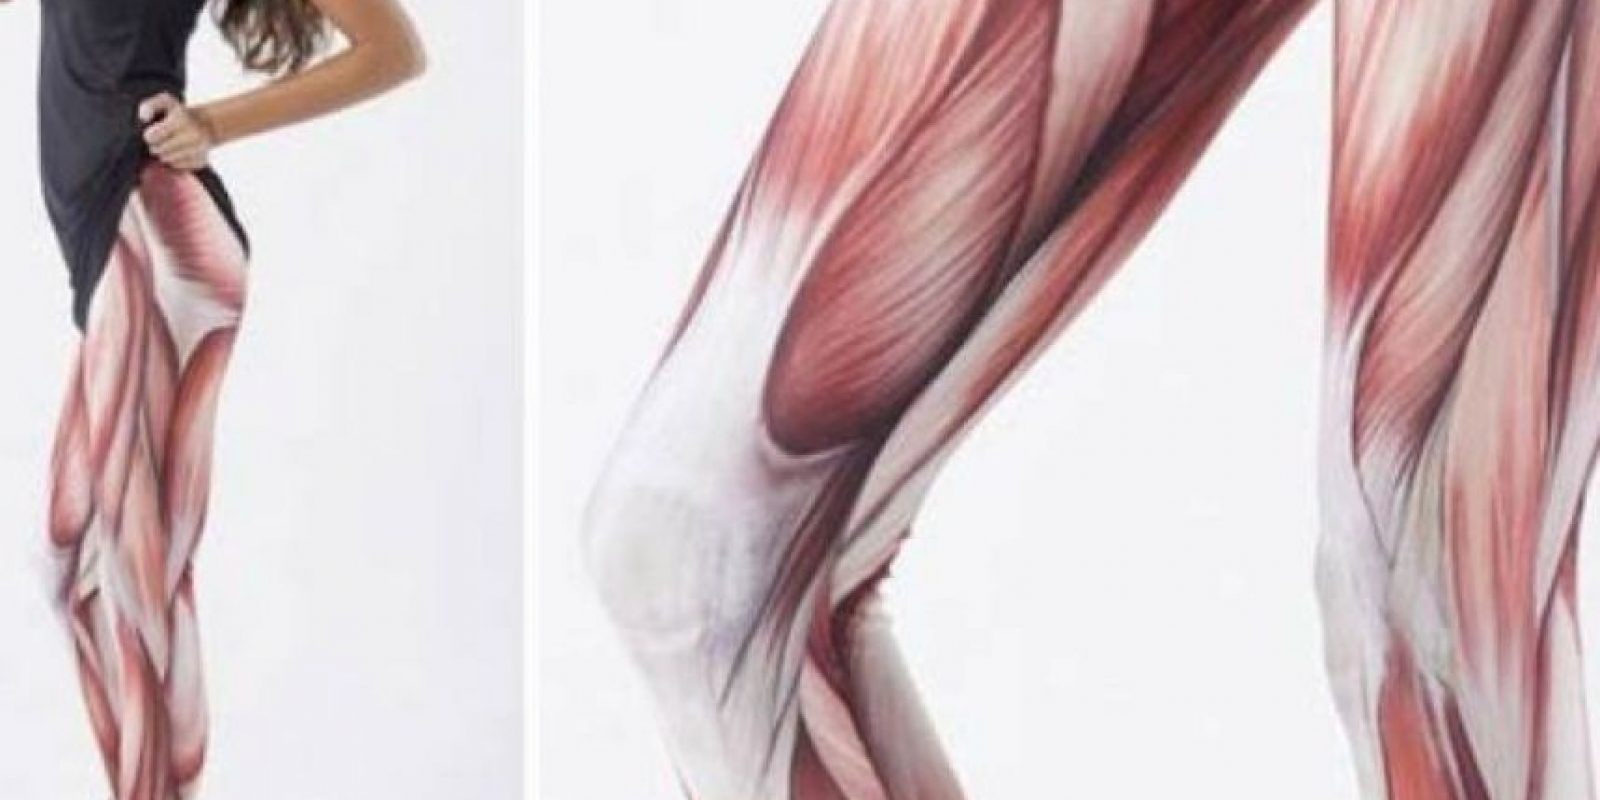 De músculos. Foto:Poorly Dressed/CheezBurguer